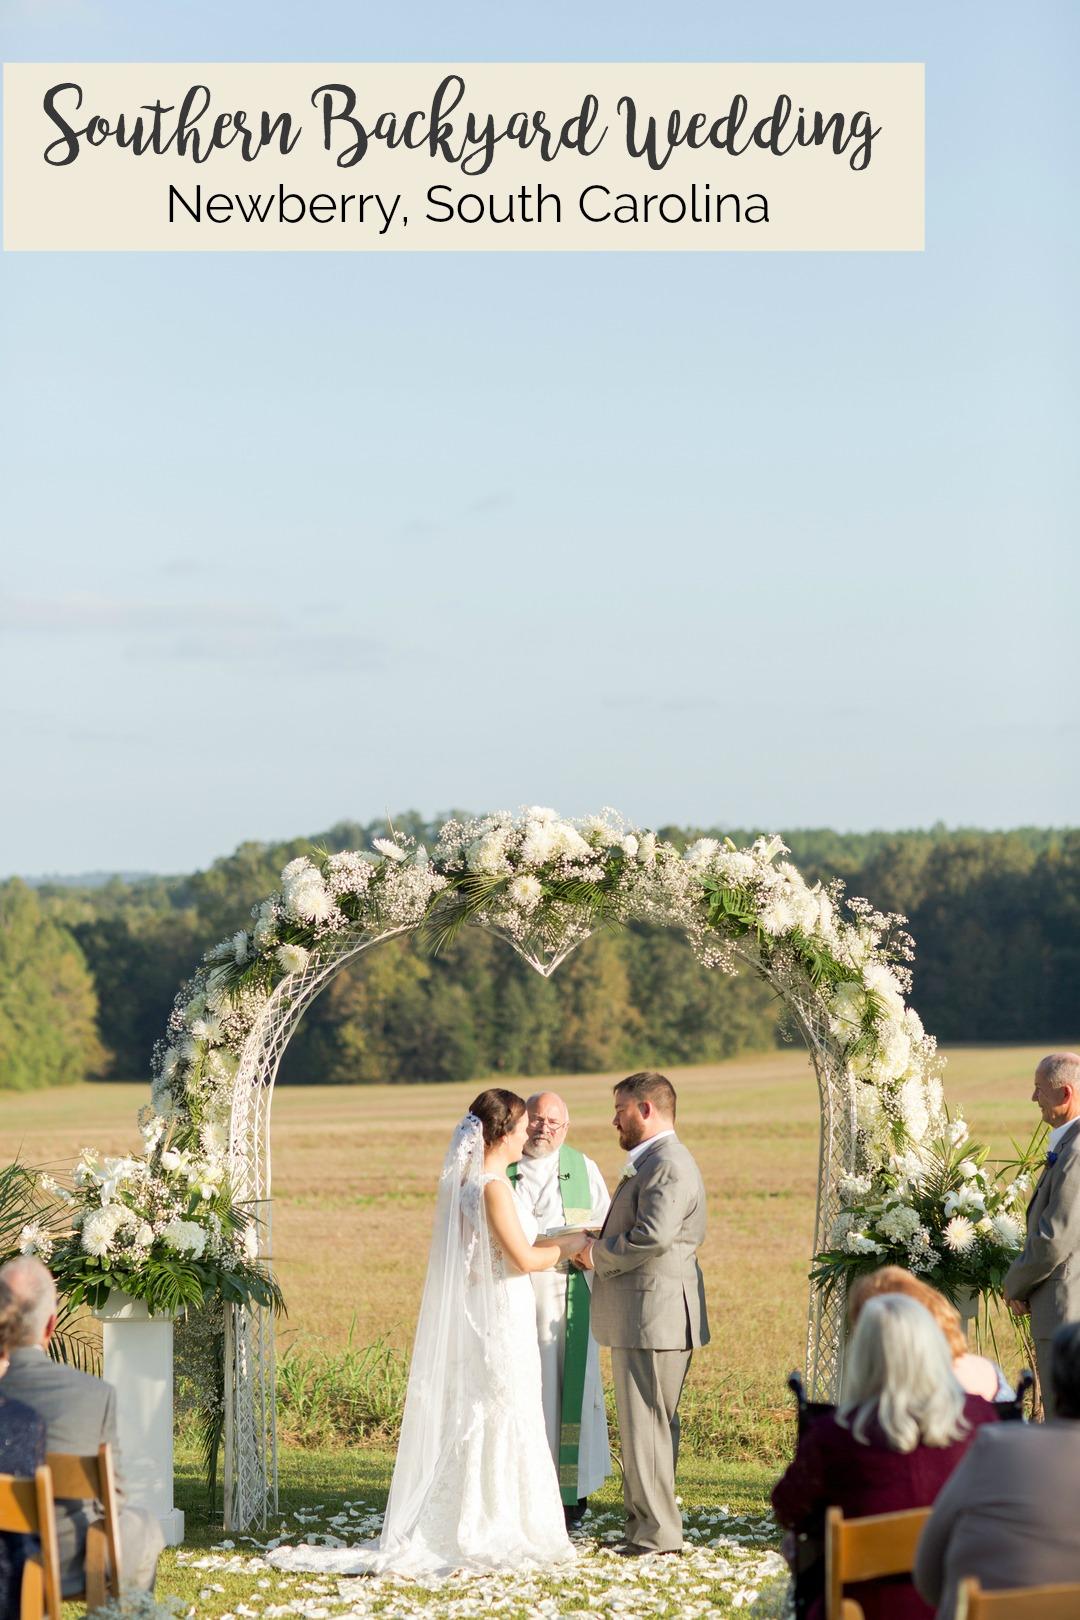 Erica + Will: Southern Backyard Wedding in Newberry, SC | Palmetto State Weddings | Jessica Hunt Photography | backyard wedding inspiration